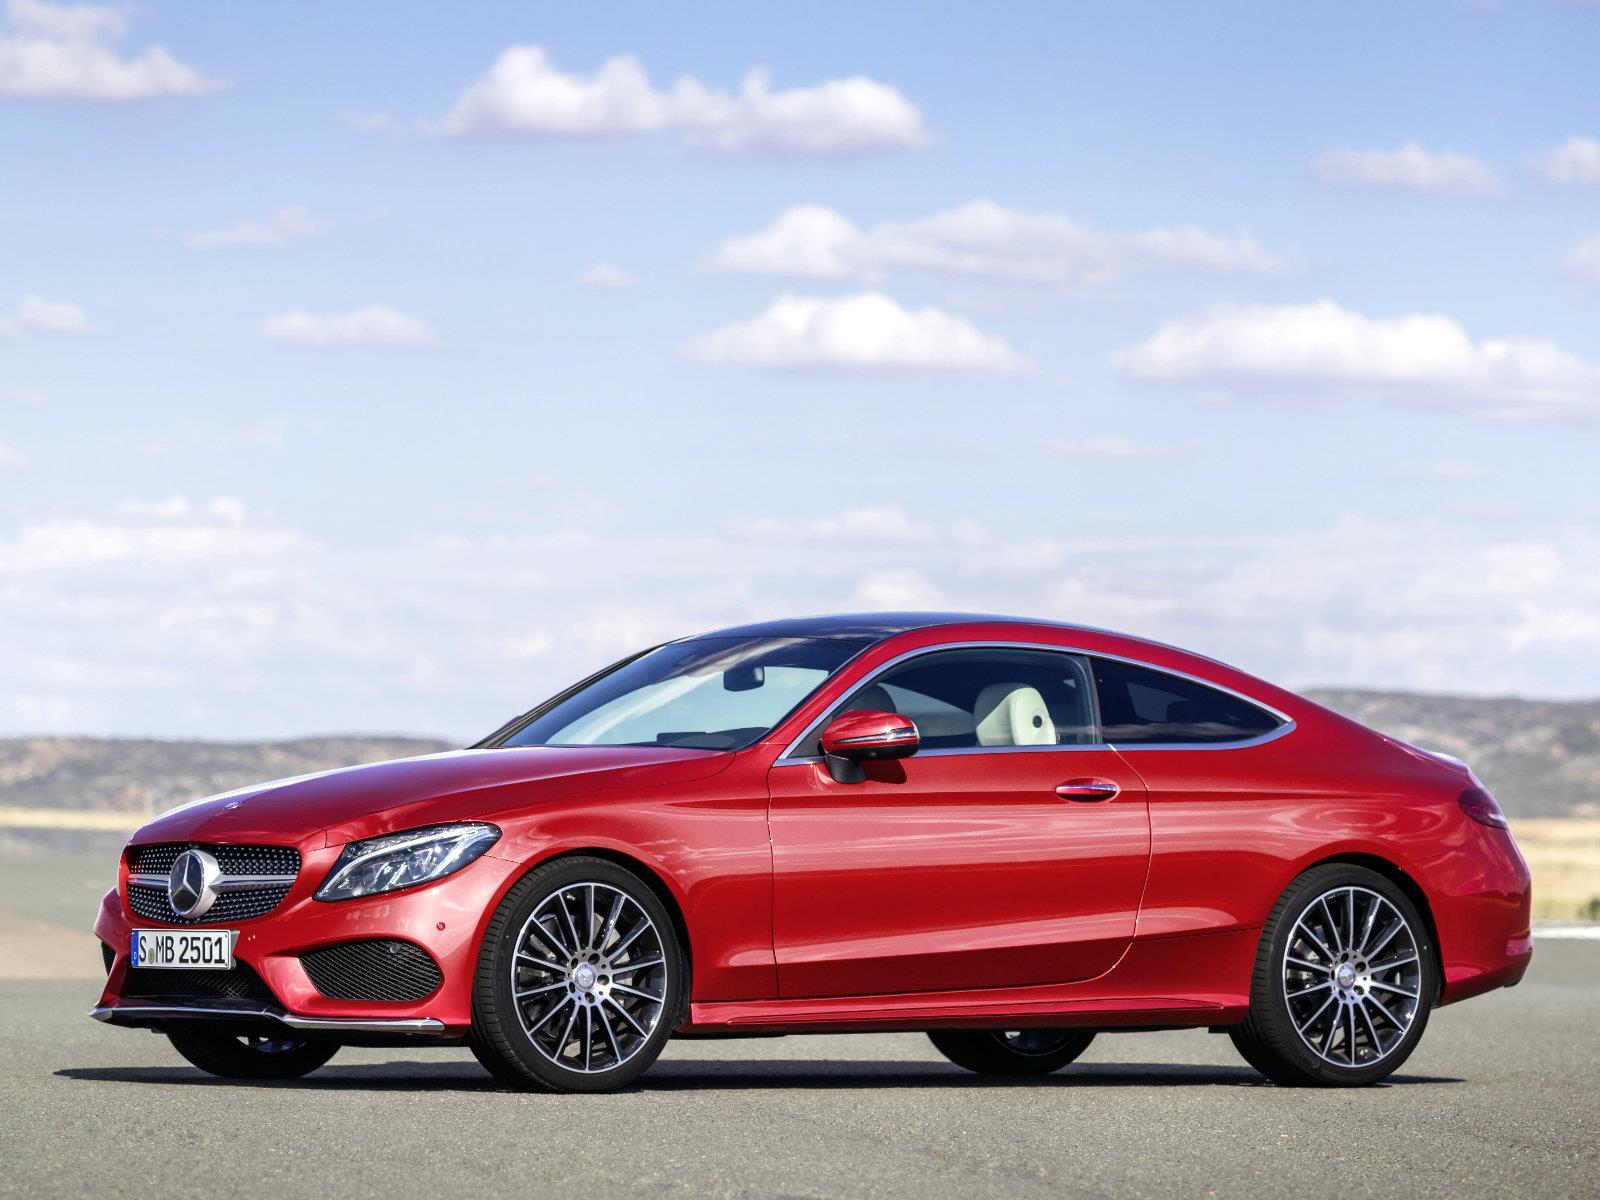 Mercedes-Benz Clase C Coupé 2017 - Autocosmos.com